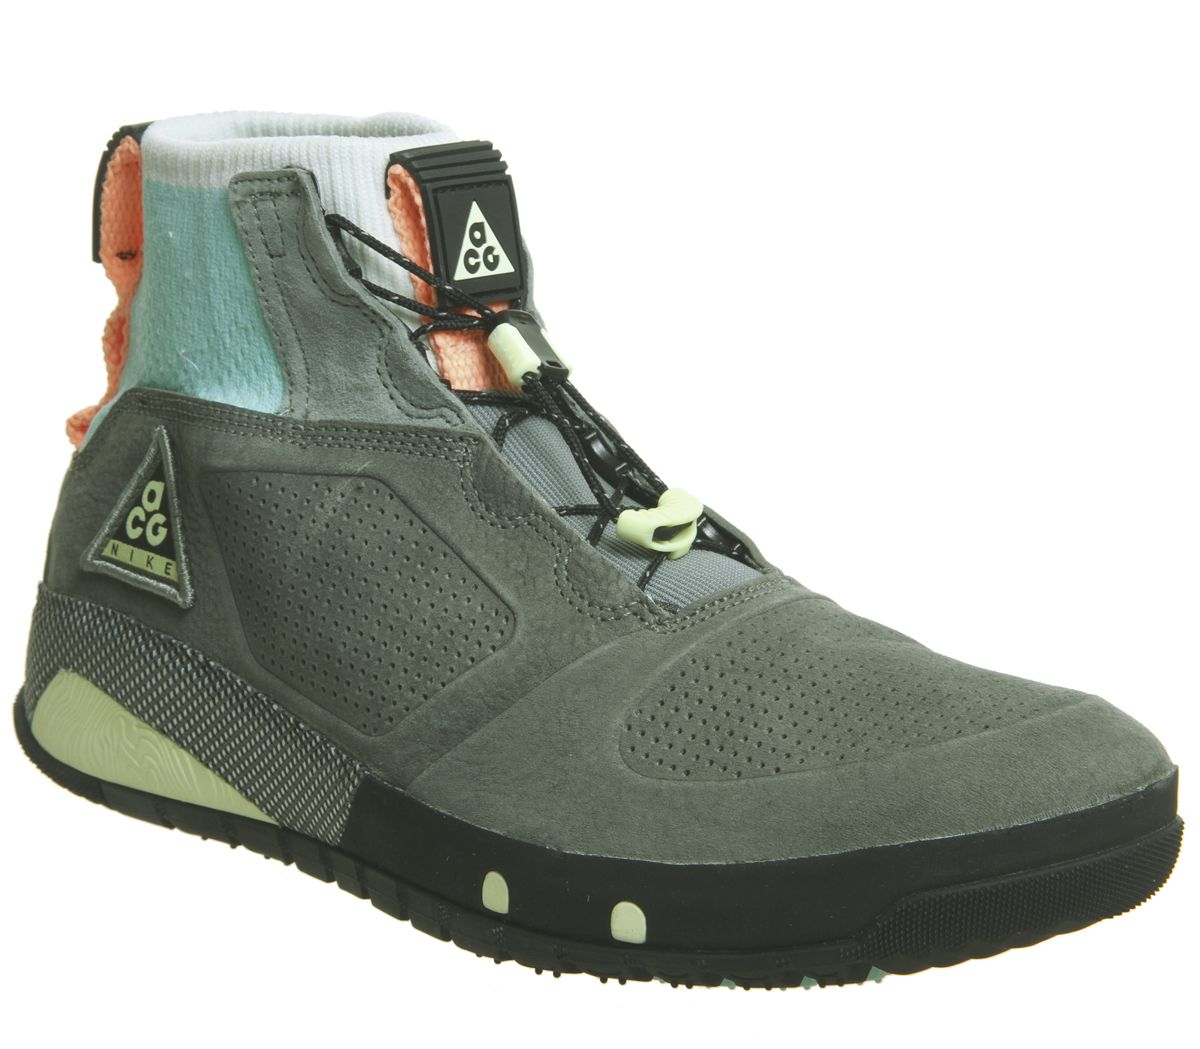 ACG Ruckel Ridge Boots